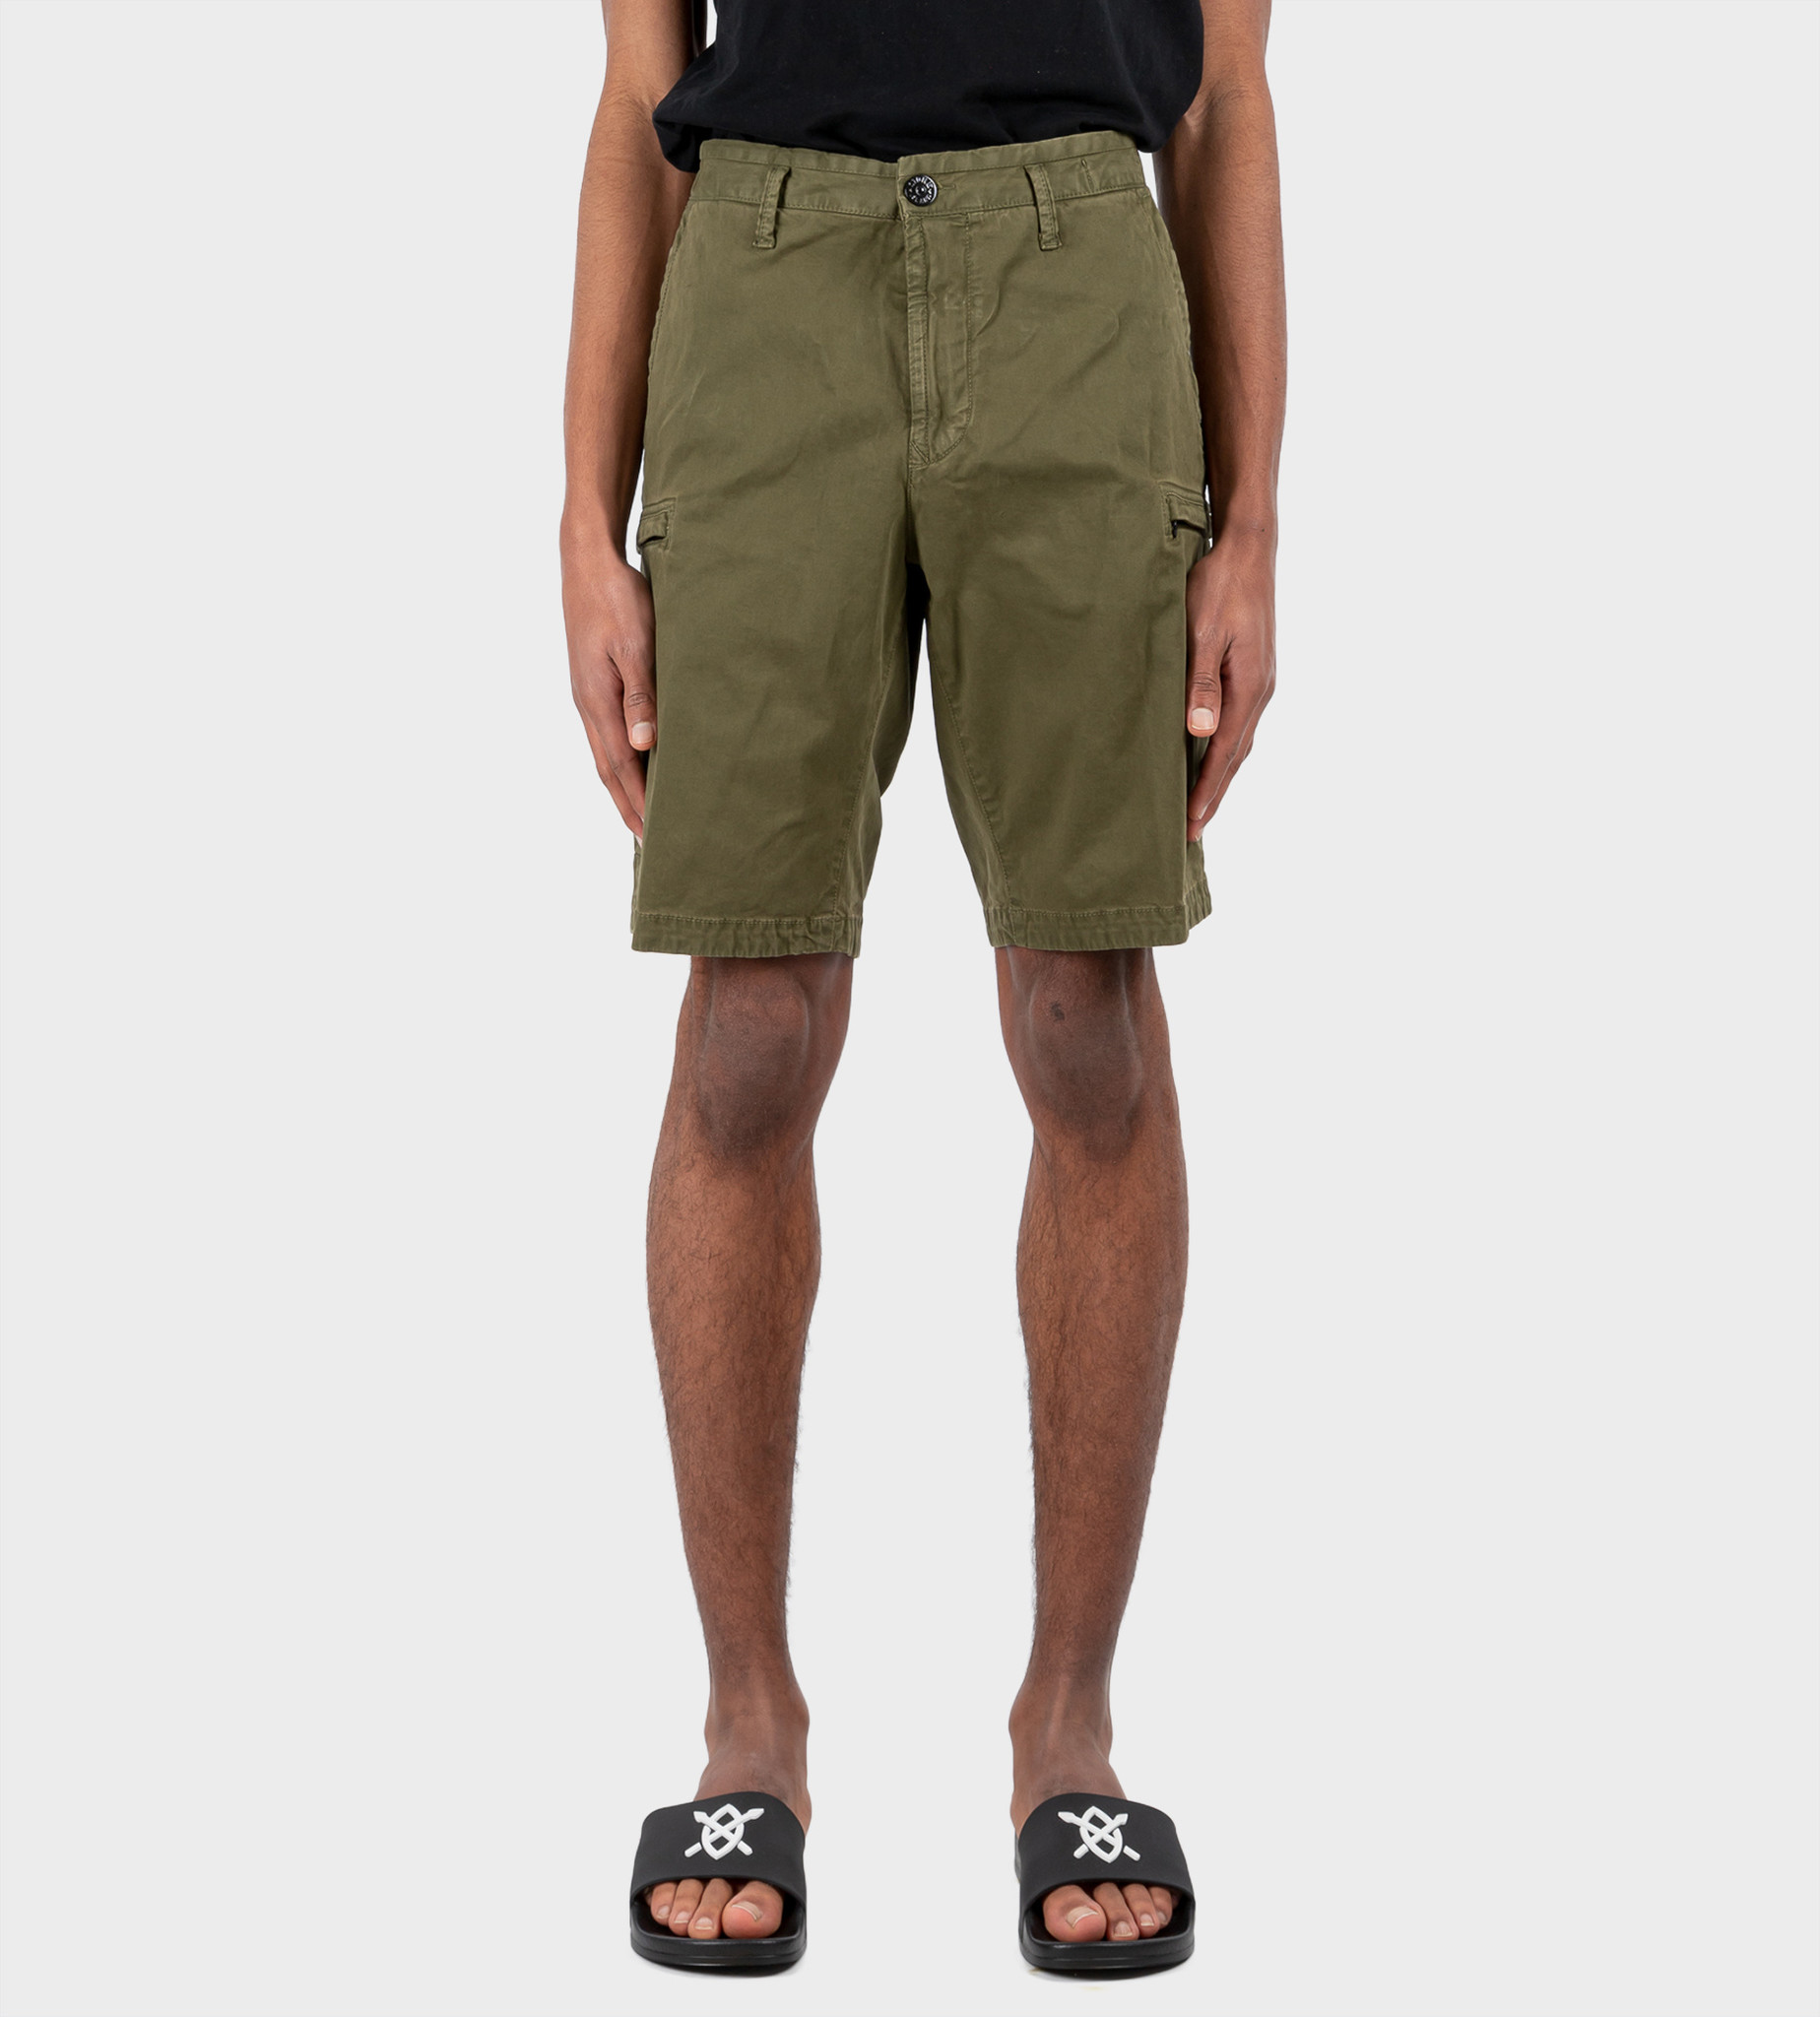 STONE ISLAND Cargo Bermuda Shorts Olive Green